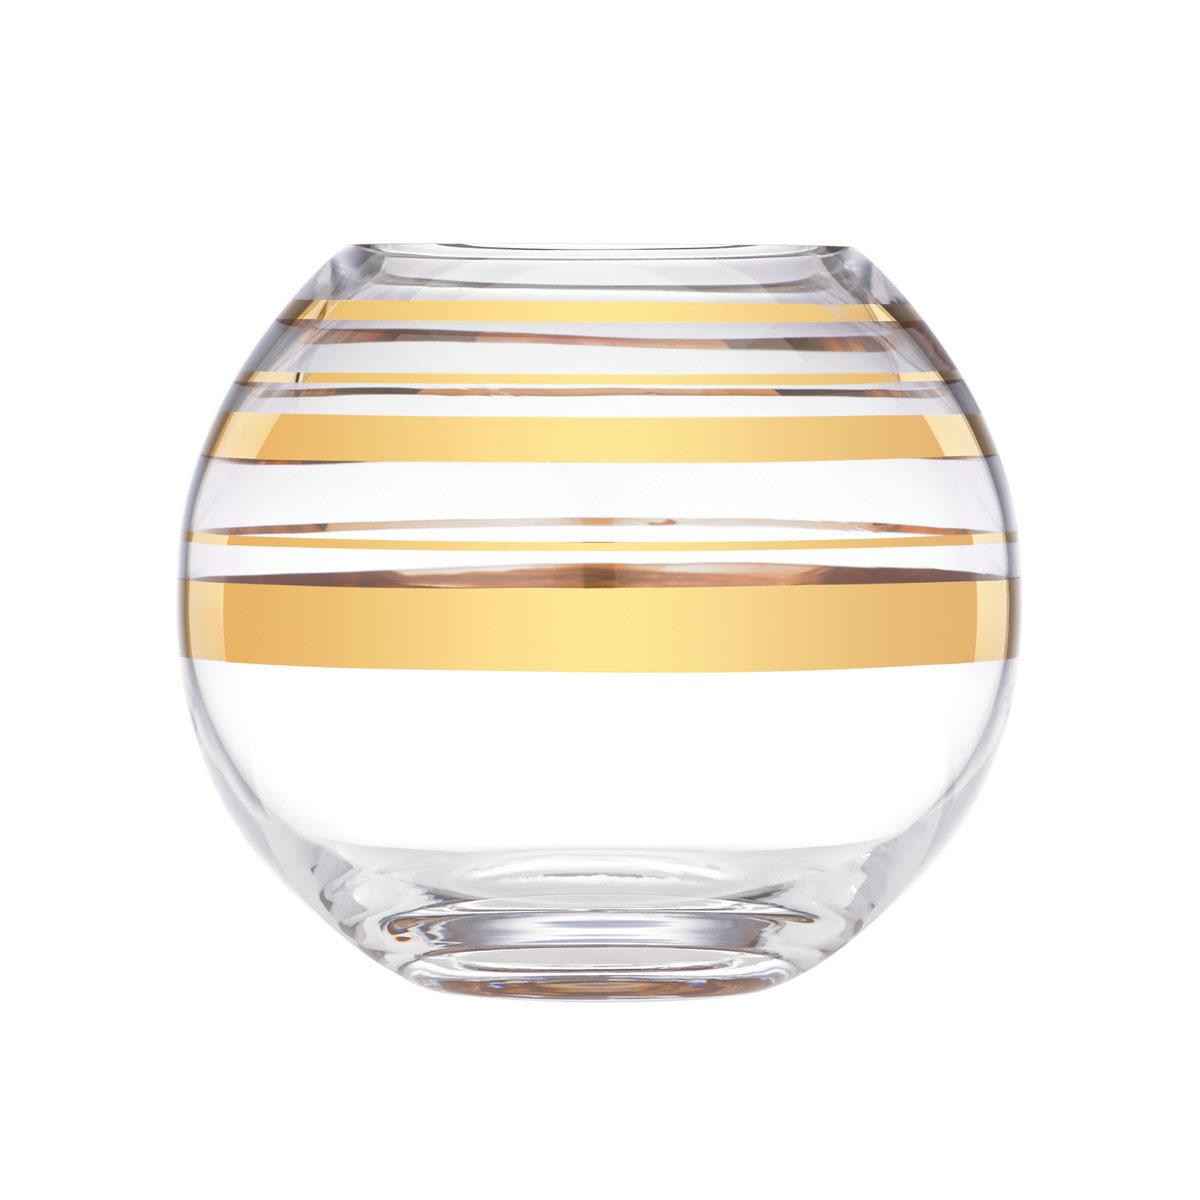 Kate Spade New York, Lenox Hampton Street Rose Crystal Bowl